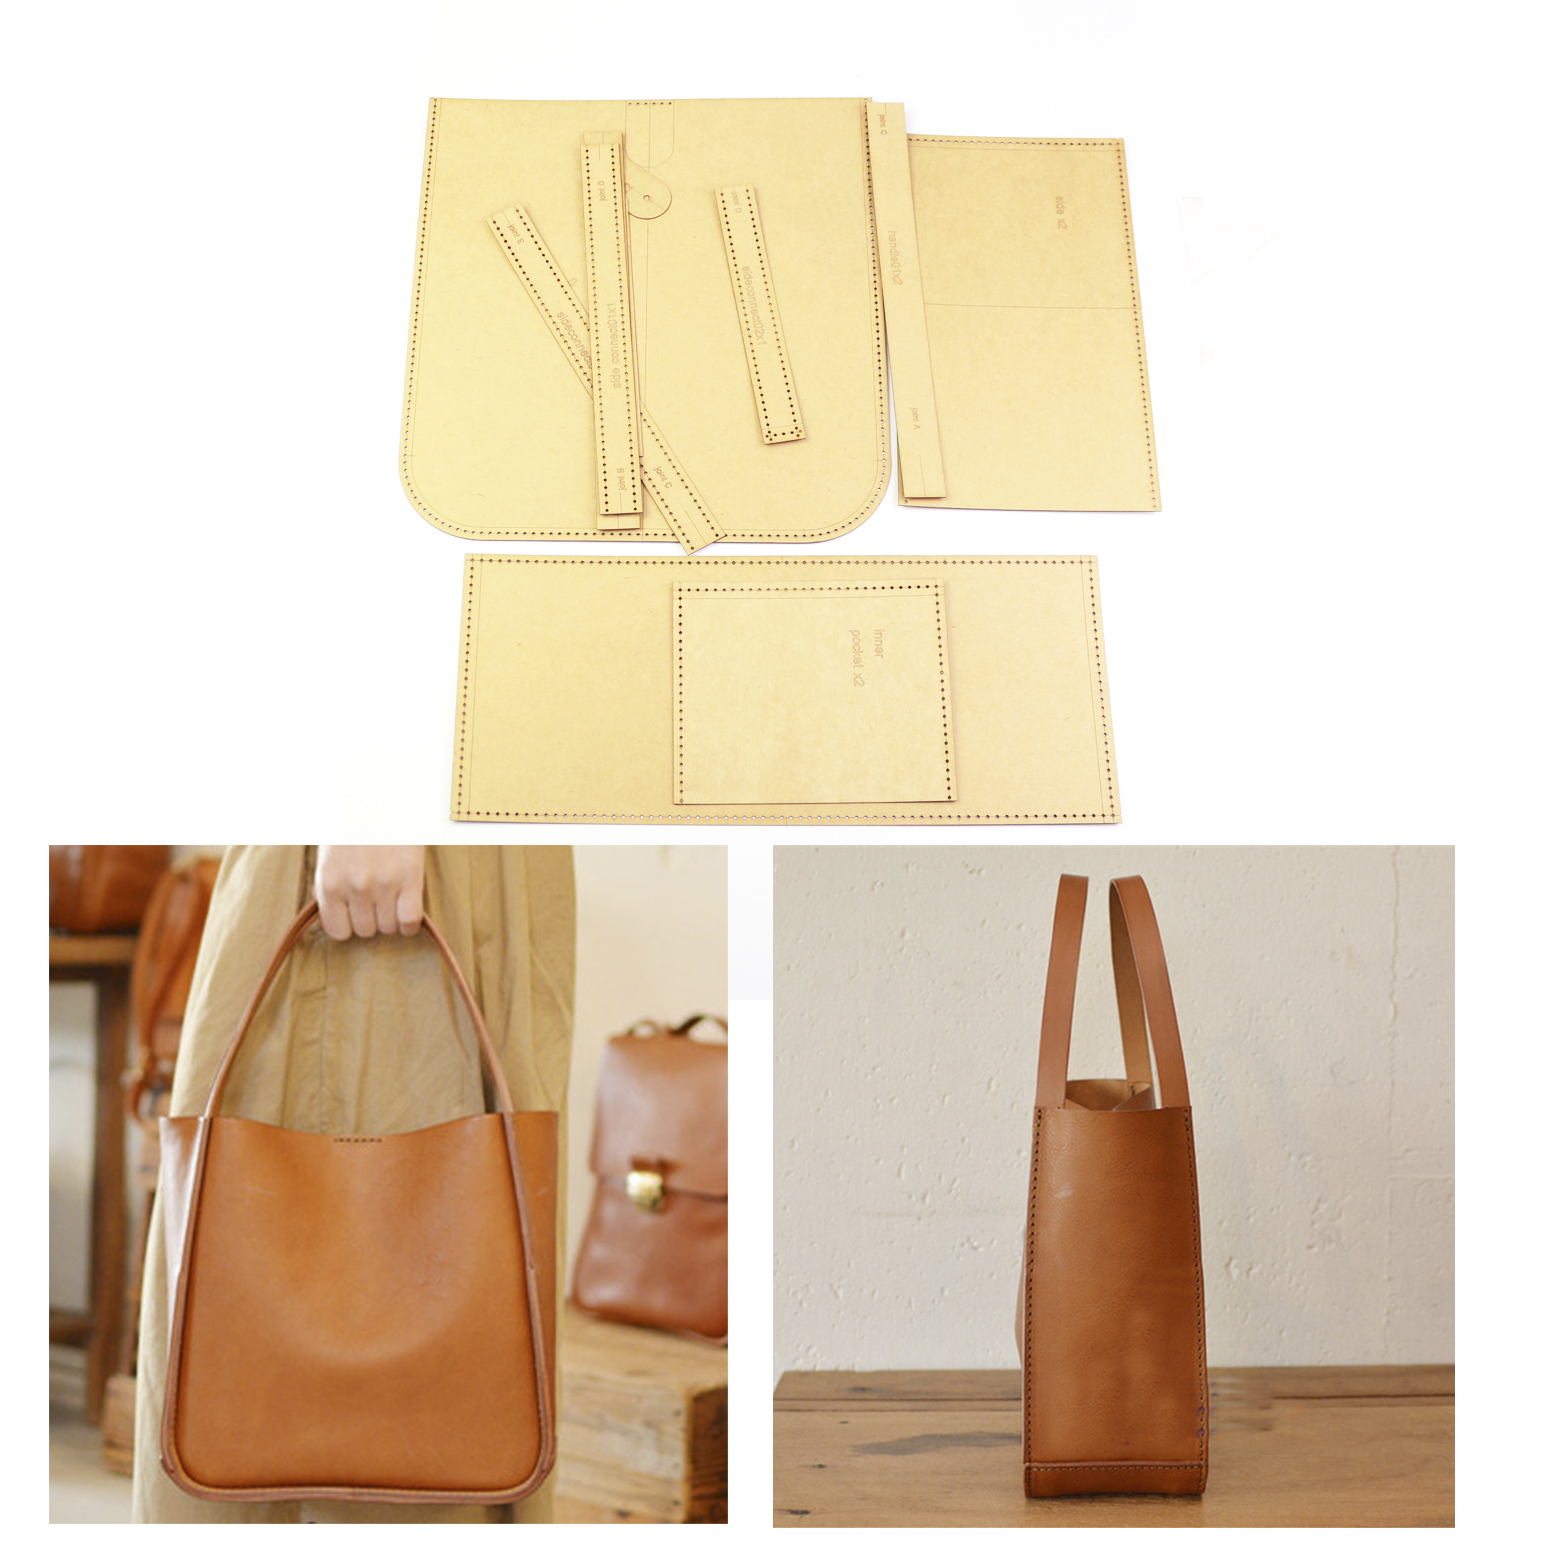 Сделай Сам кожа Крафт Женская сумка ведро крафт-бумага высечка шаблон выдолбленный трафарет 24x23x12cm